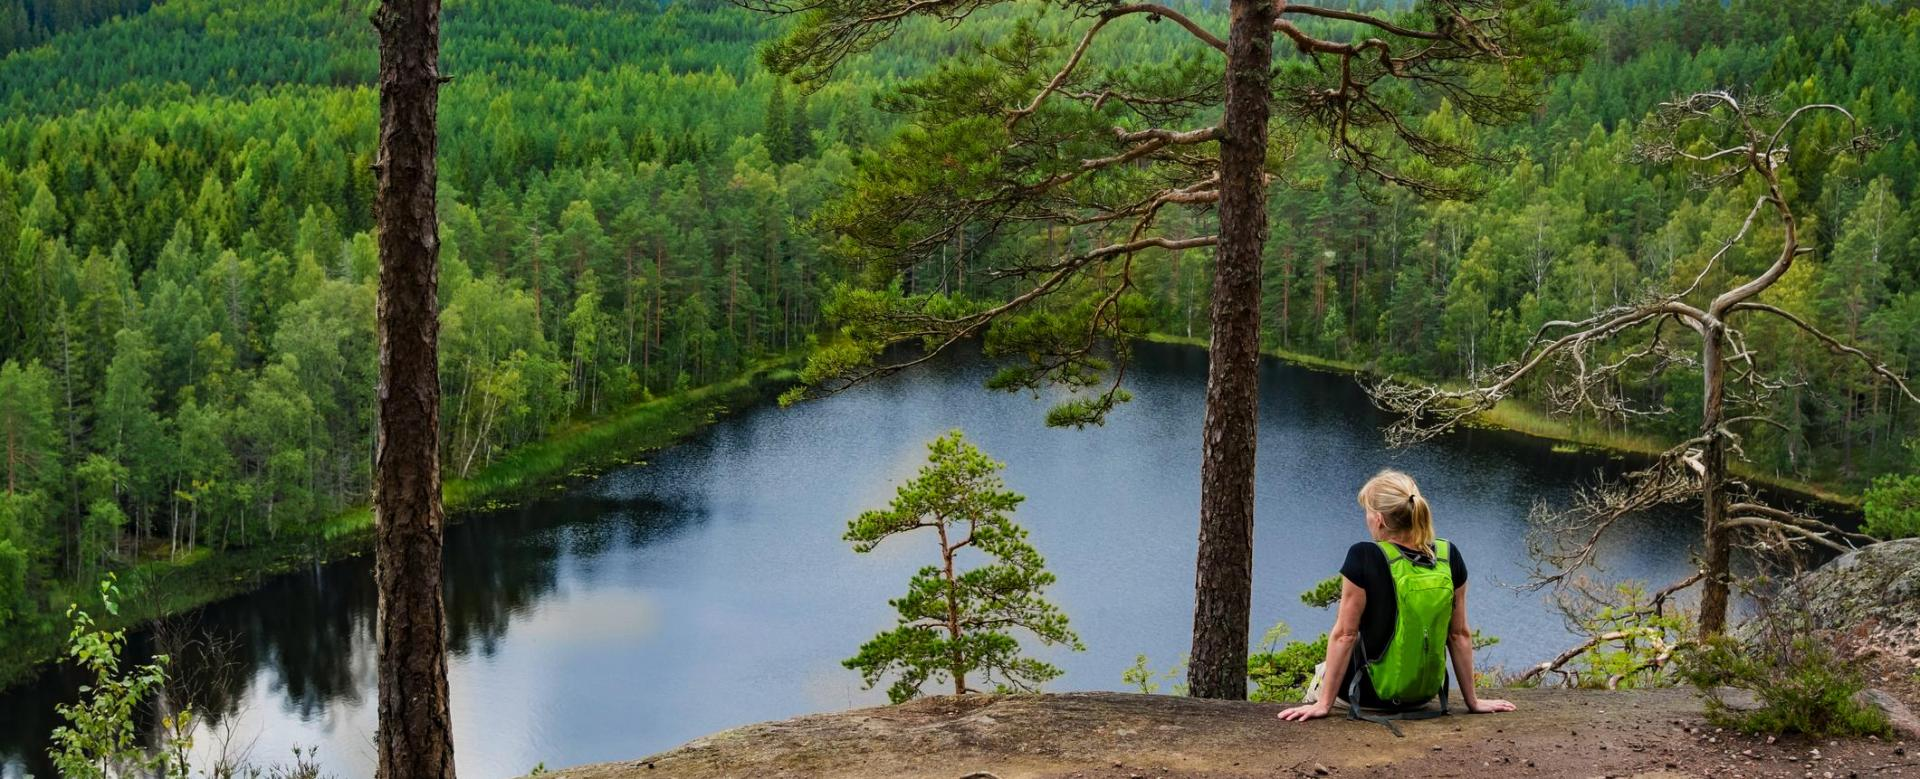 Voyage à pied : Finlande : Multiactivités à kiilopaa